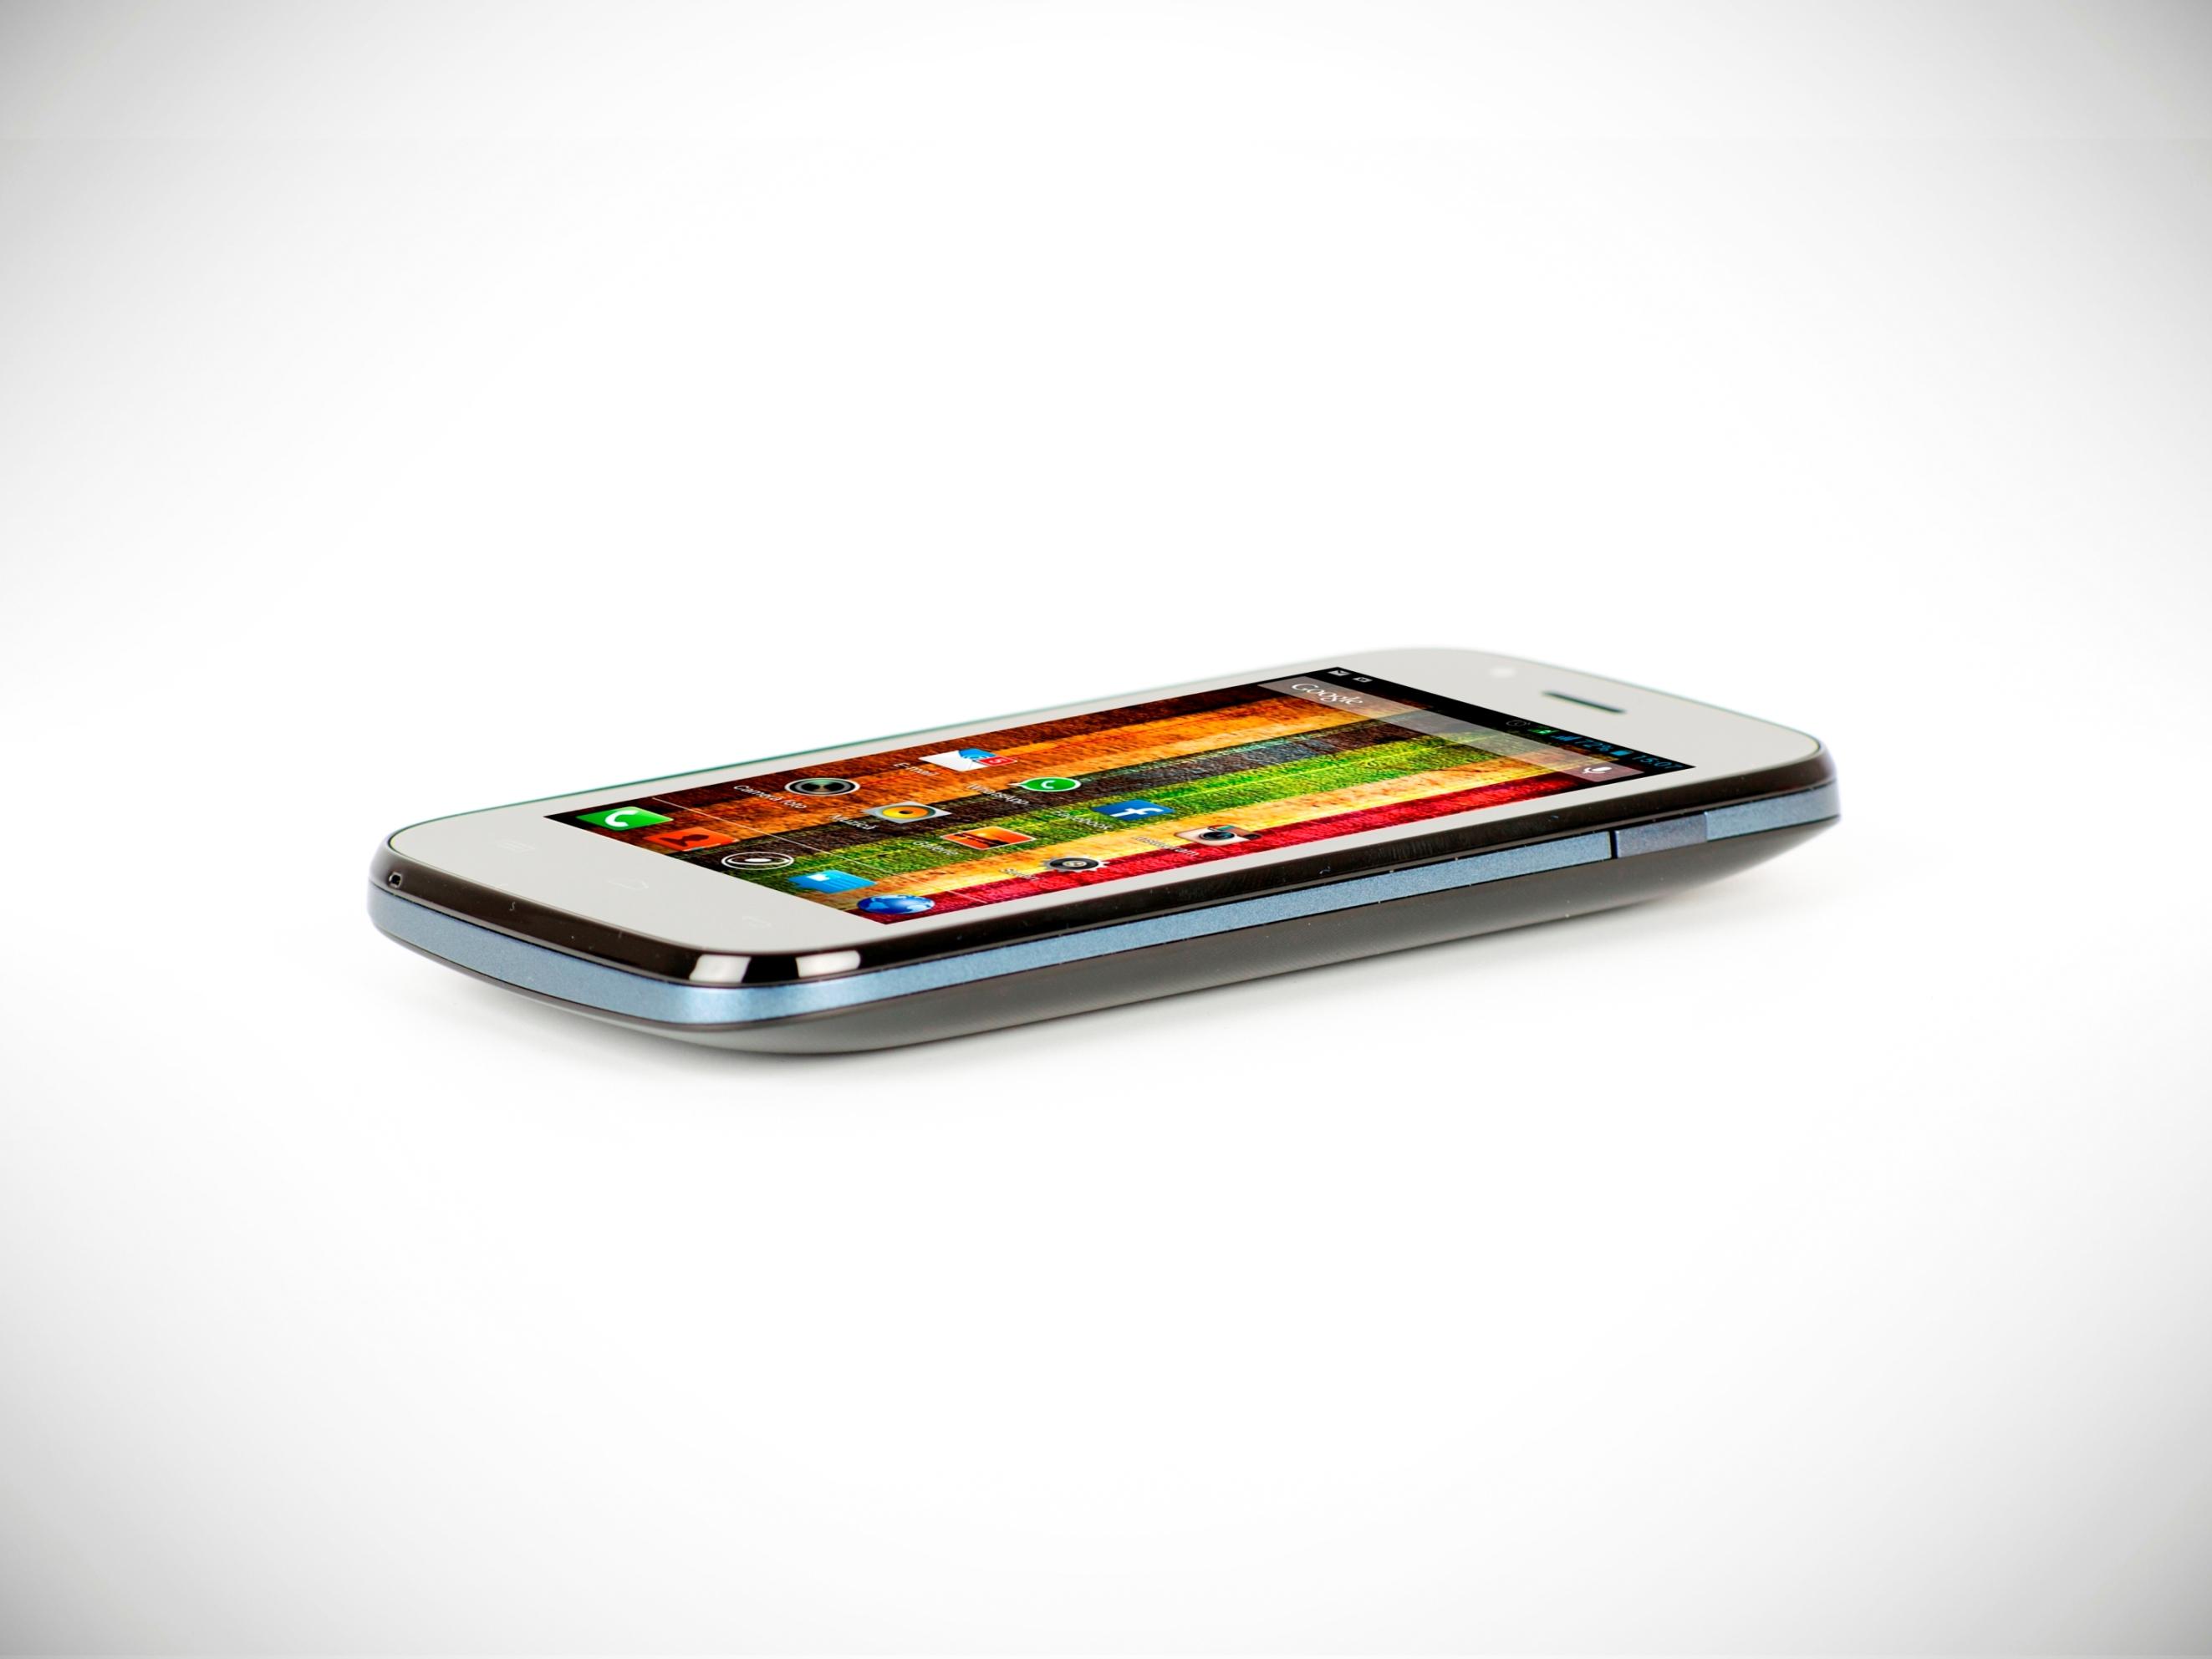 E-Boda lanseaza smartphone-urile Raindbow V40 si Sunny V35 pentru utilizatorii incepatori